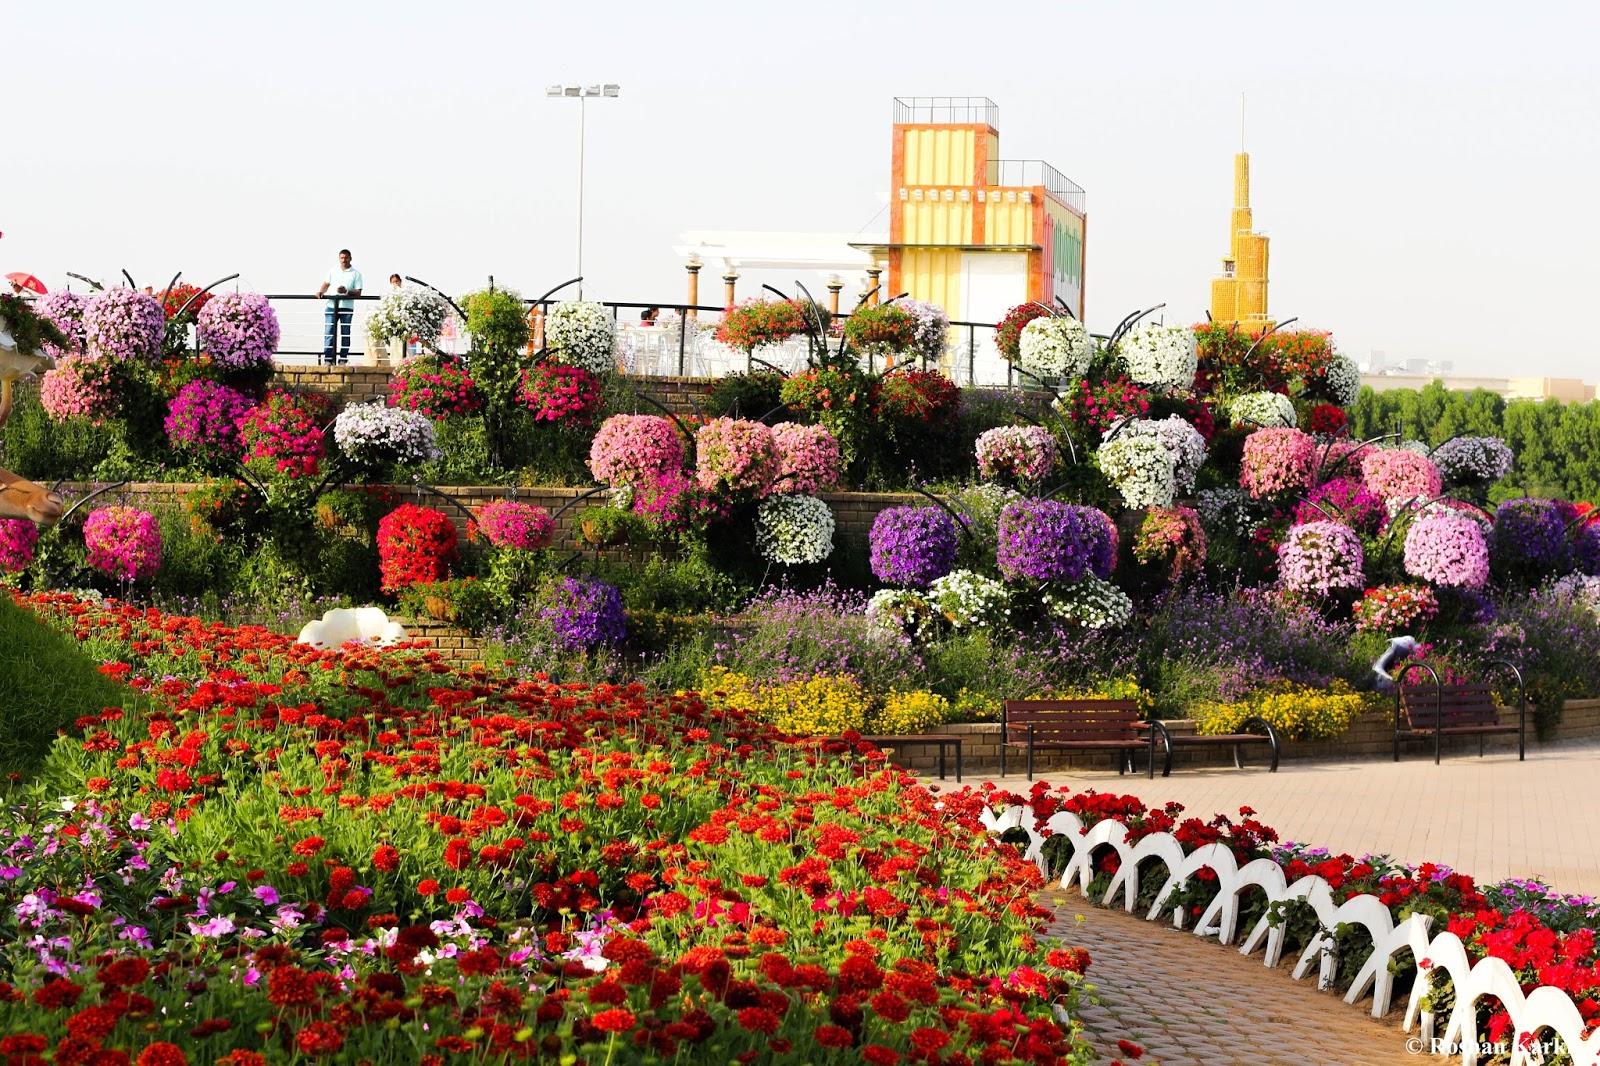 Flowers Garden | The Street Photo Blog of SankhuPalubari !!